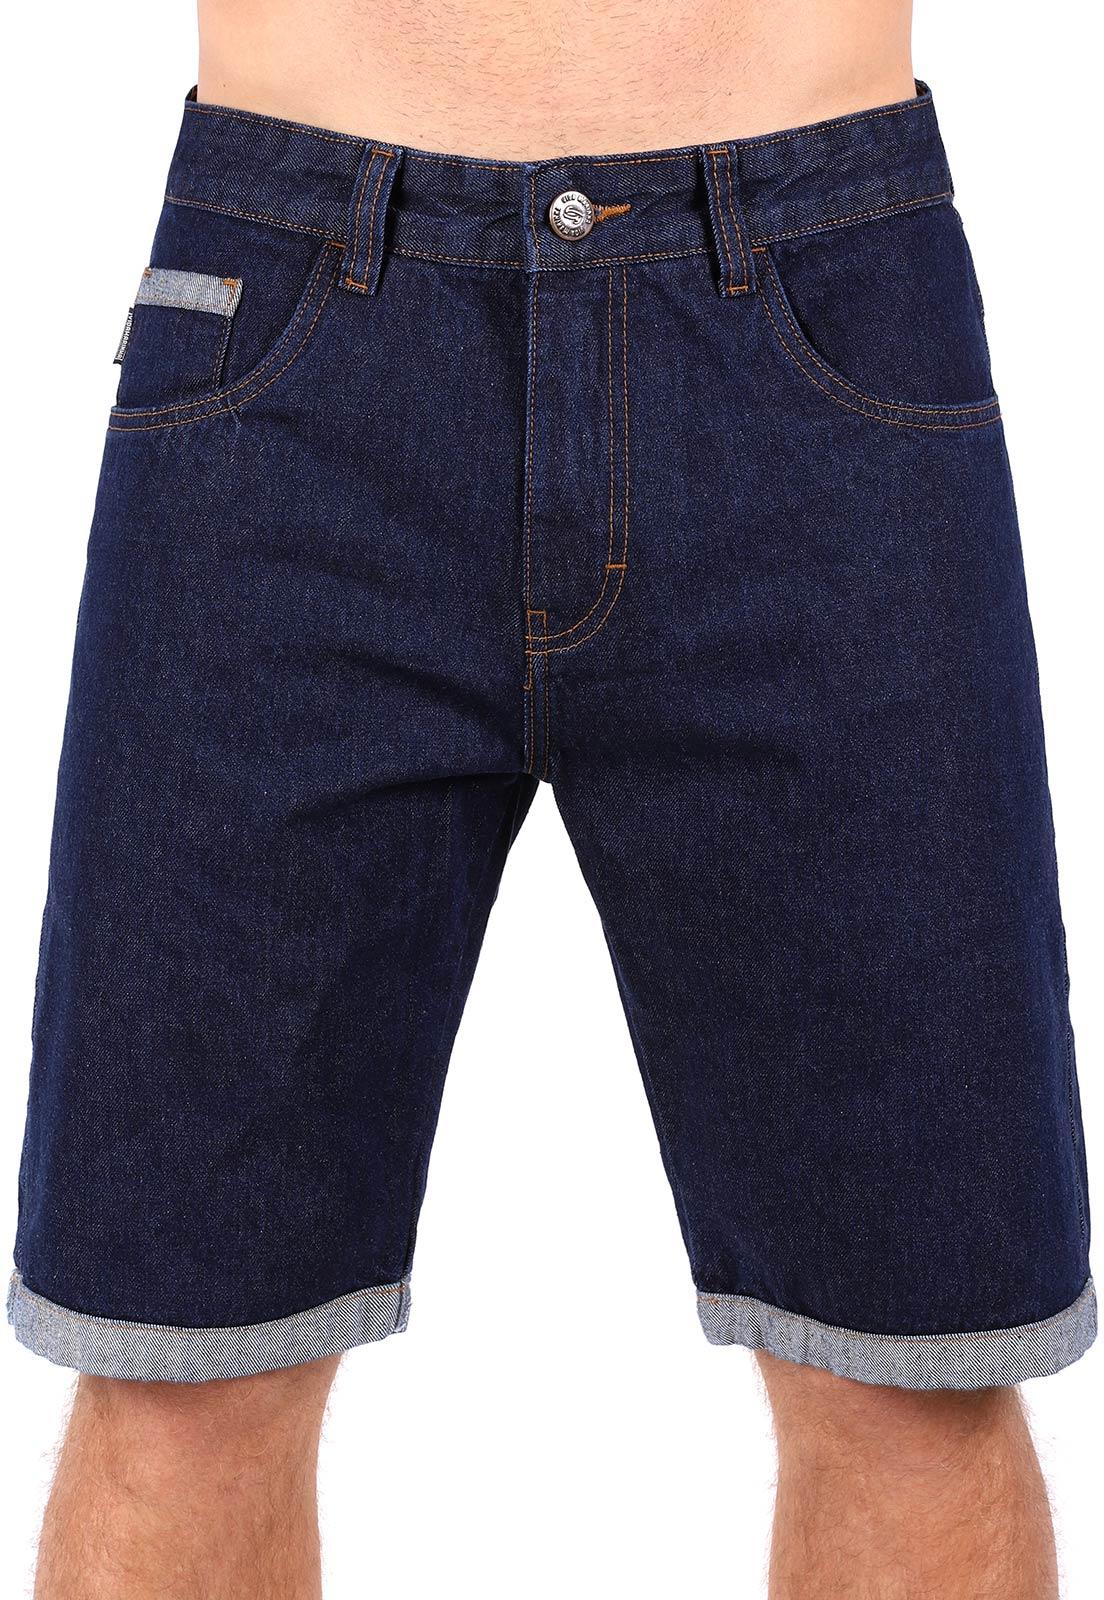 Bermuda Jeans Vida Marinha Azul Marinho